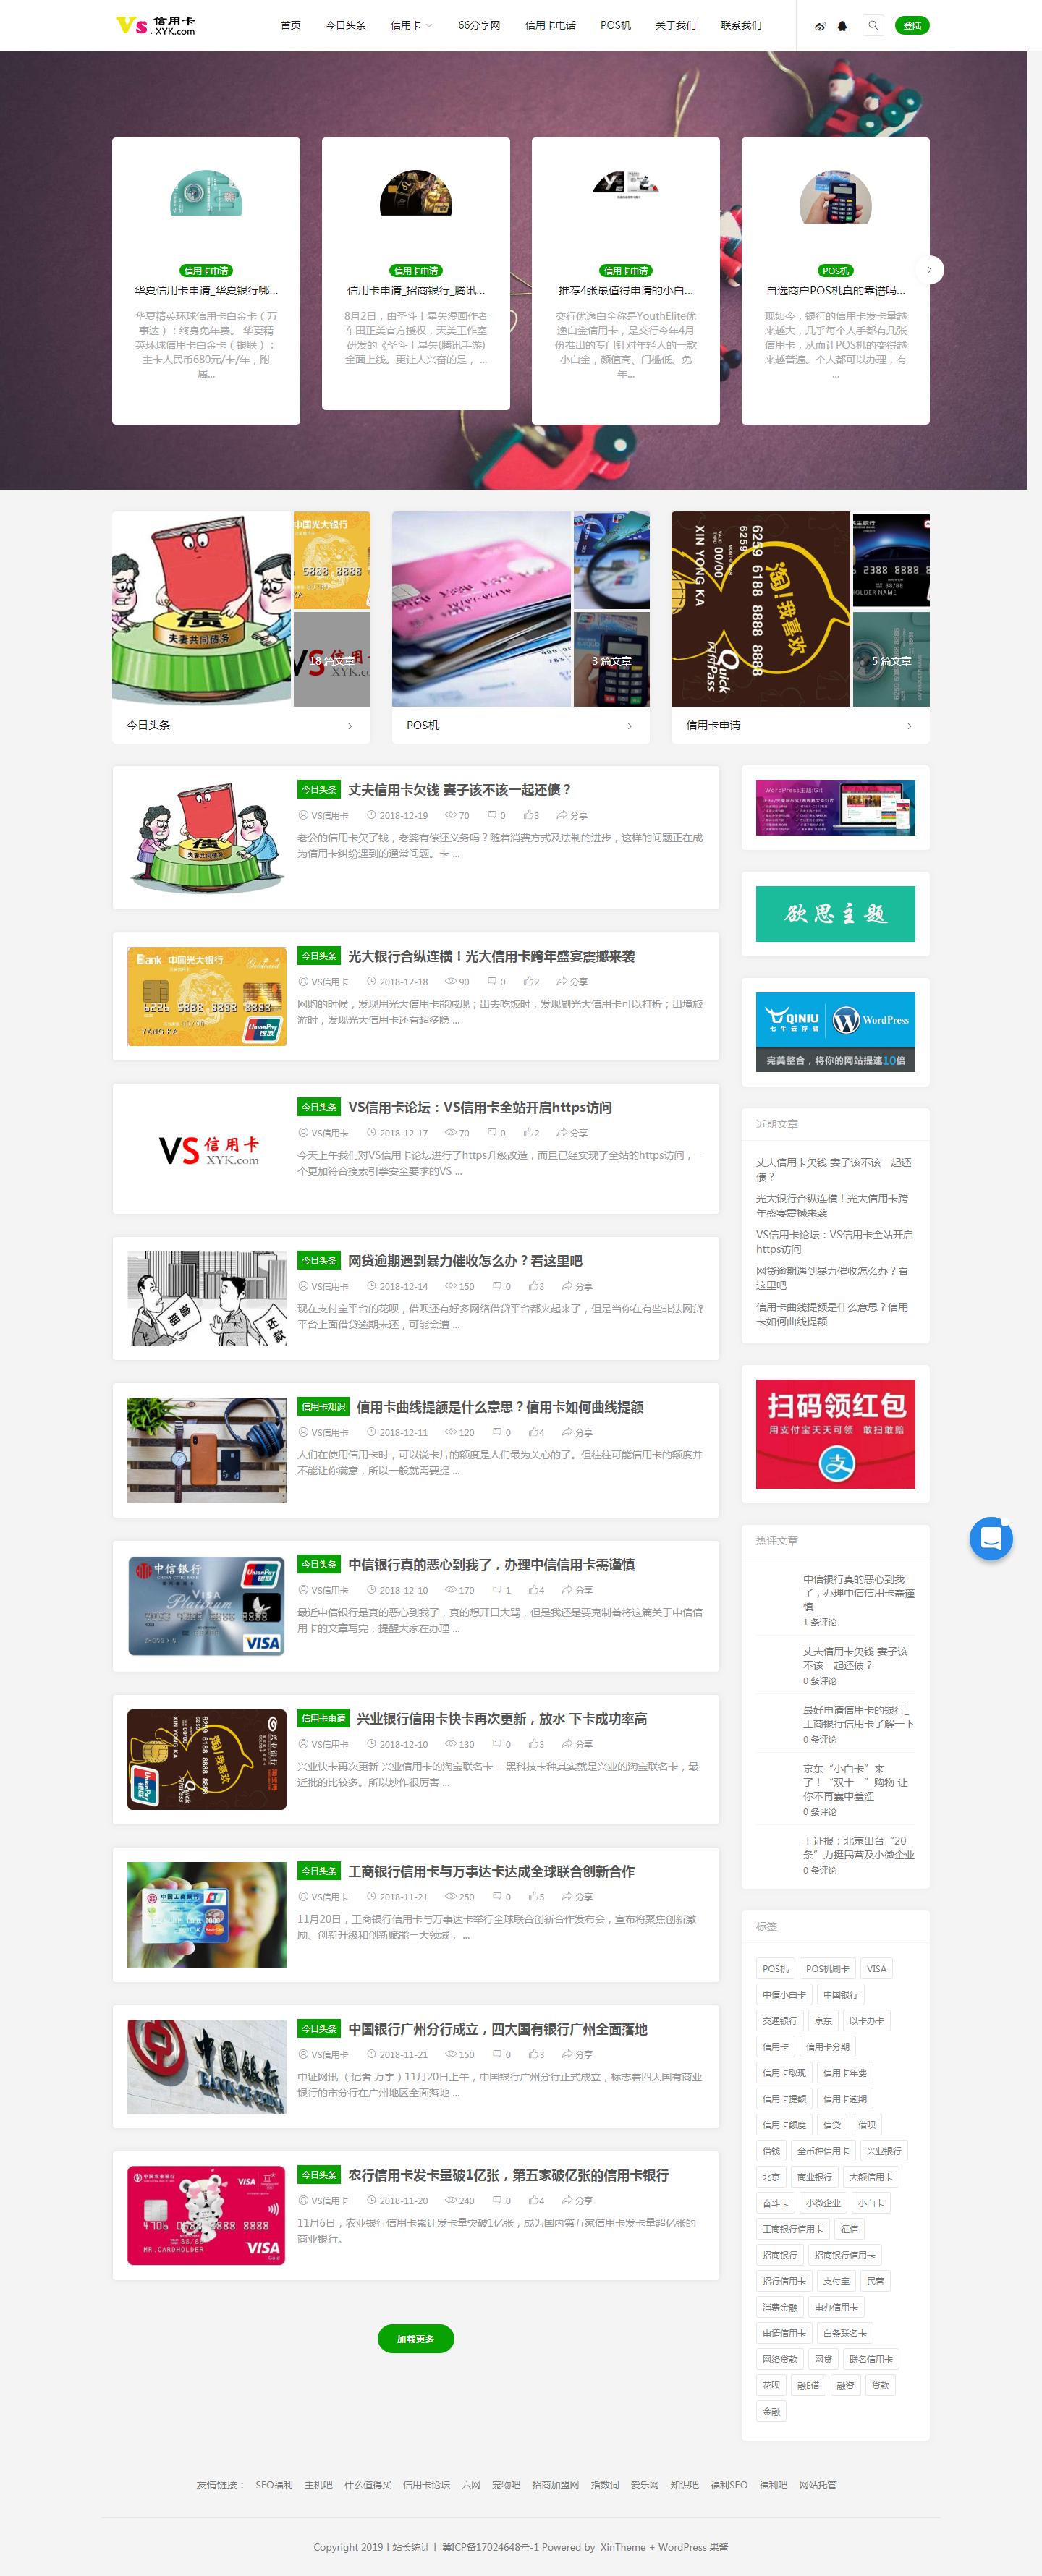 VS信用卡:一个专注信用卡知识分享的交流网站